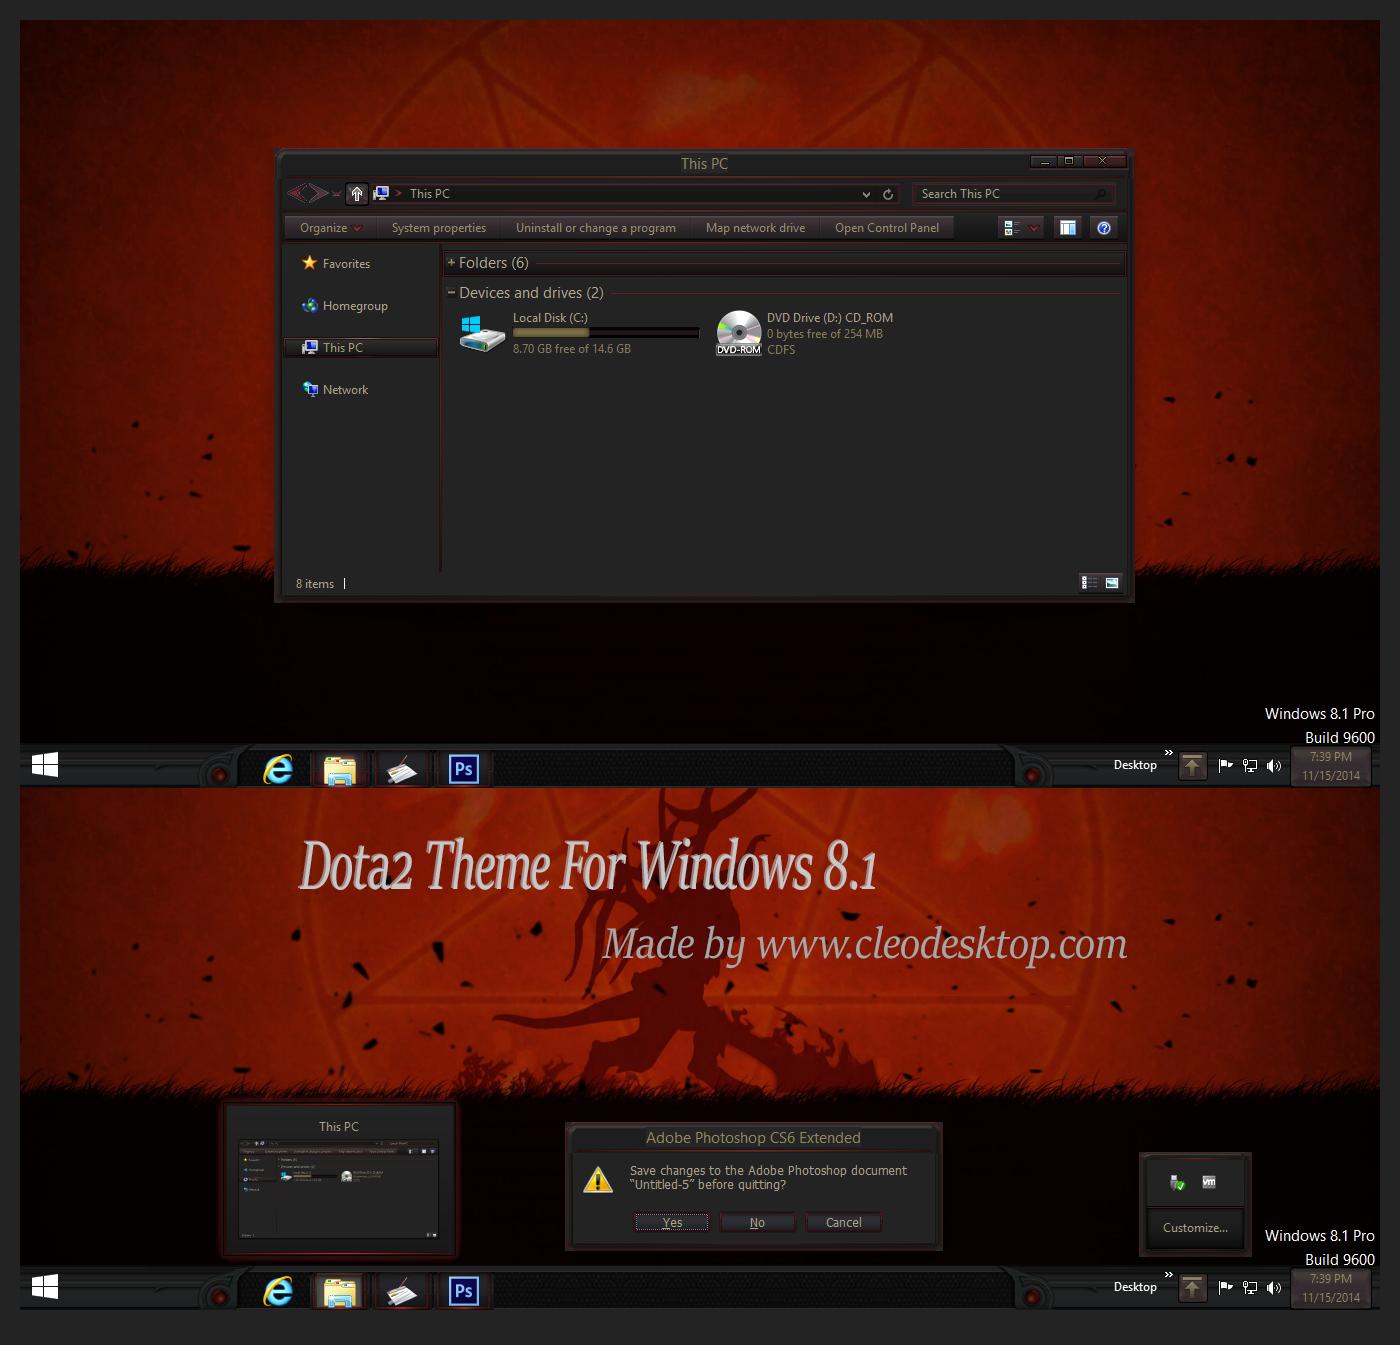 dota 2 game theme for windows 8 1 cleodesktop download http www